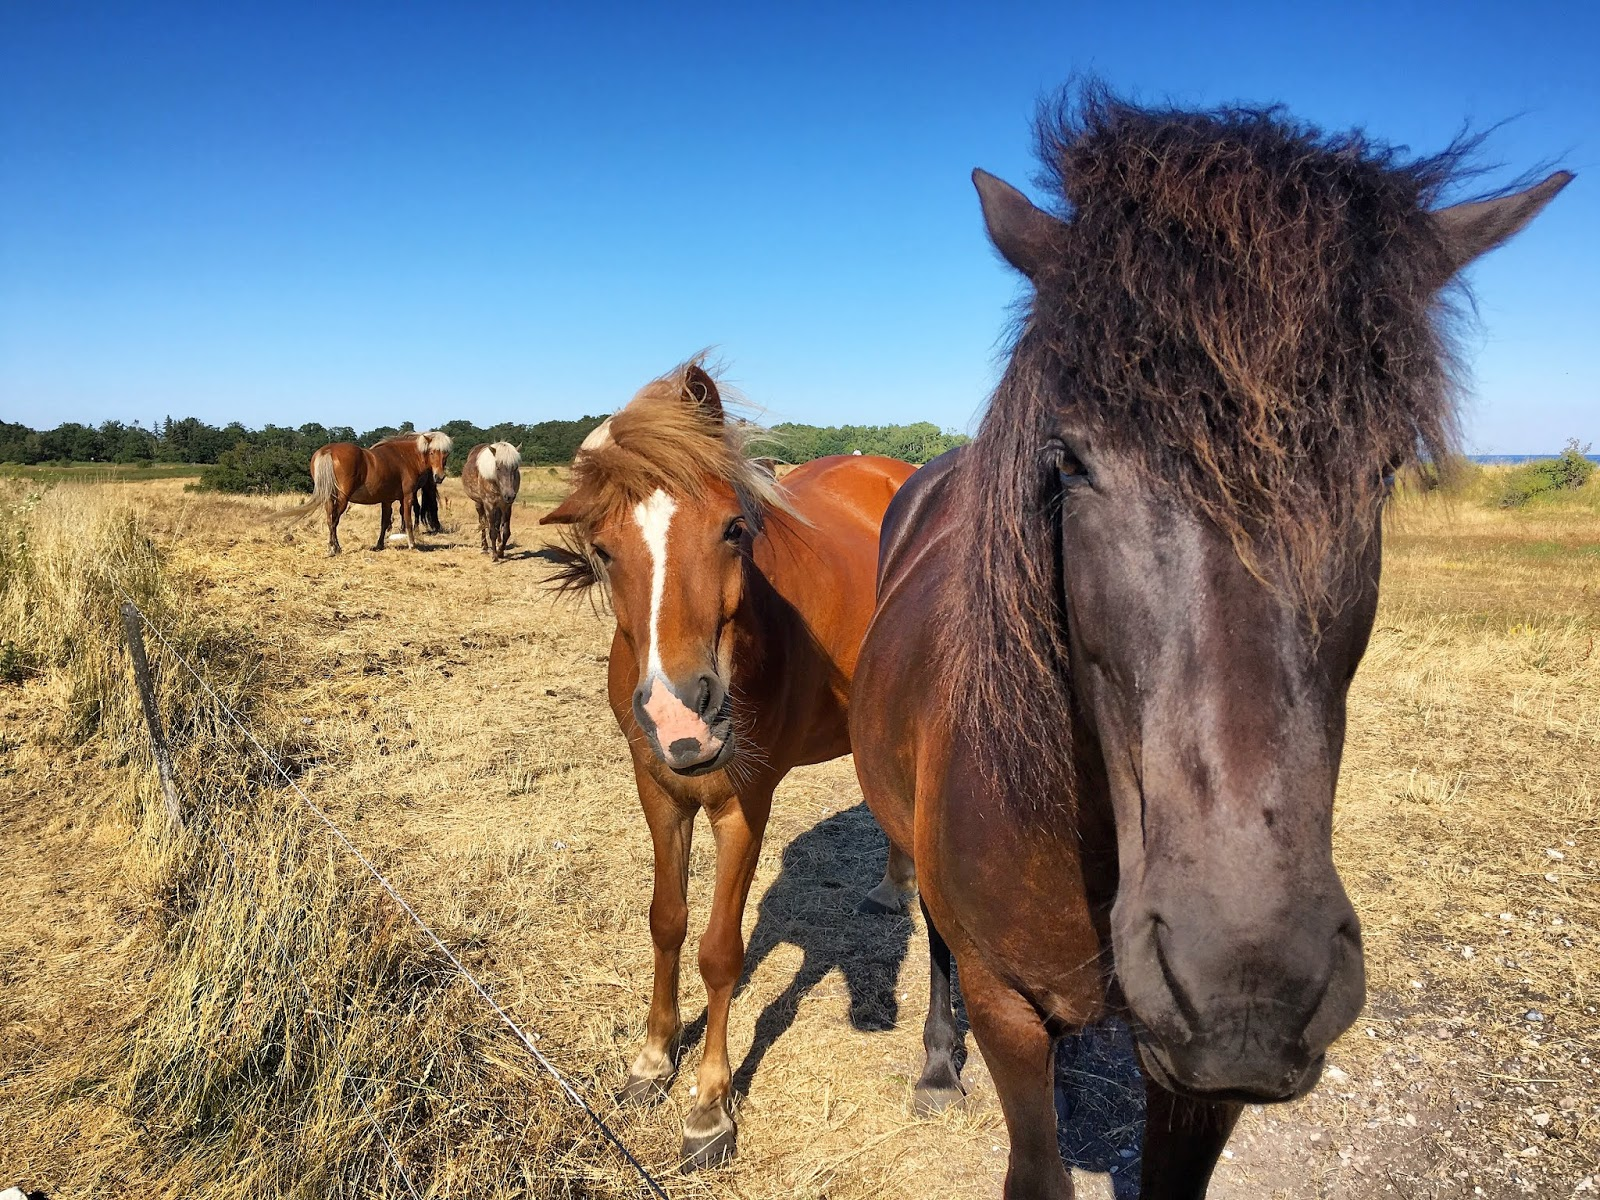 Heste (DE), DE